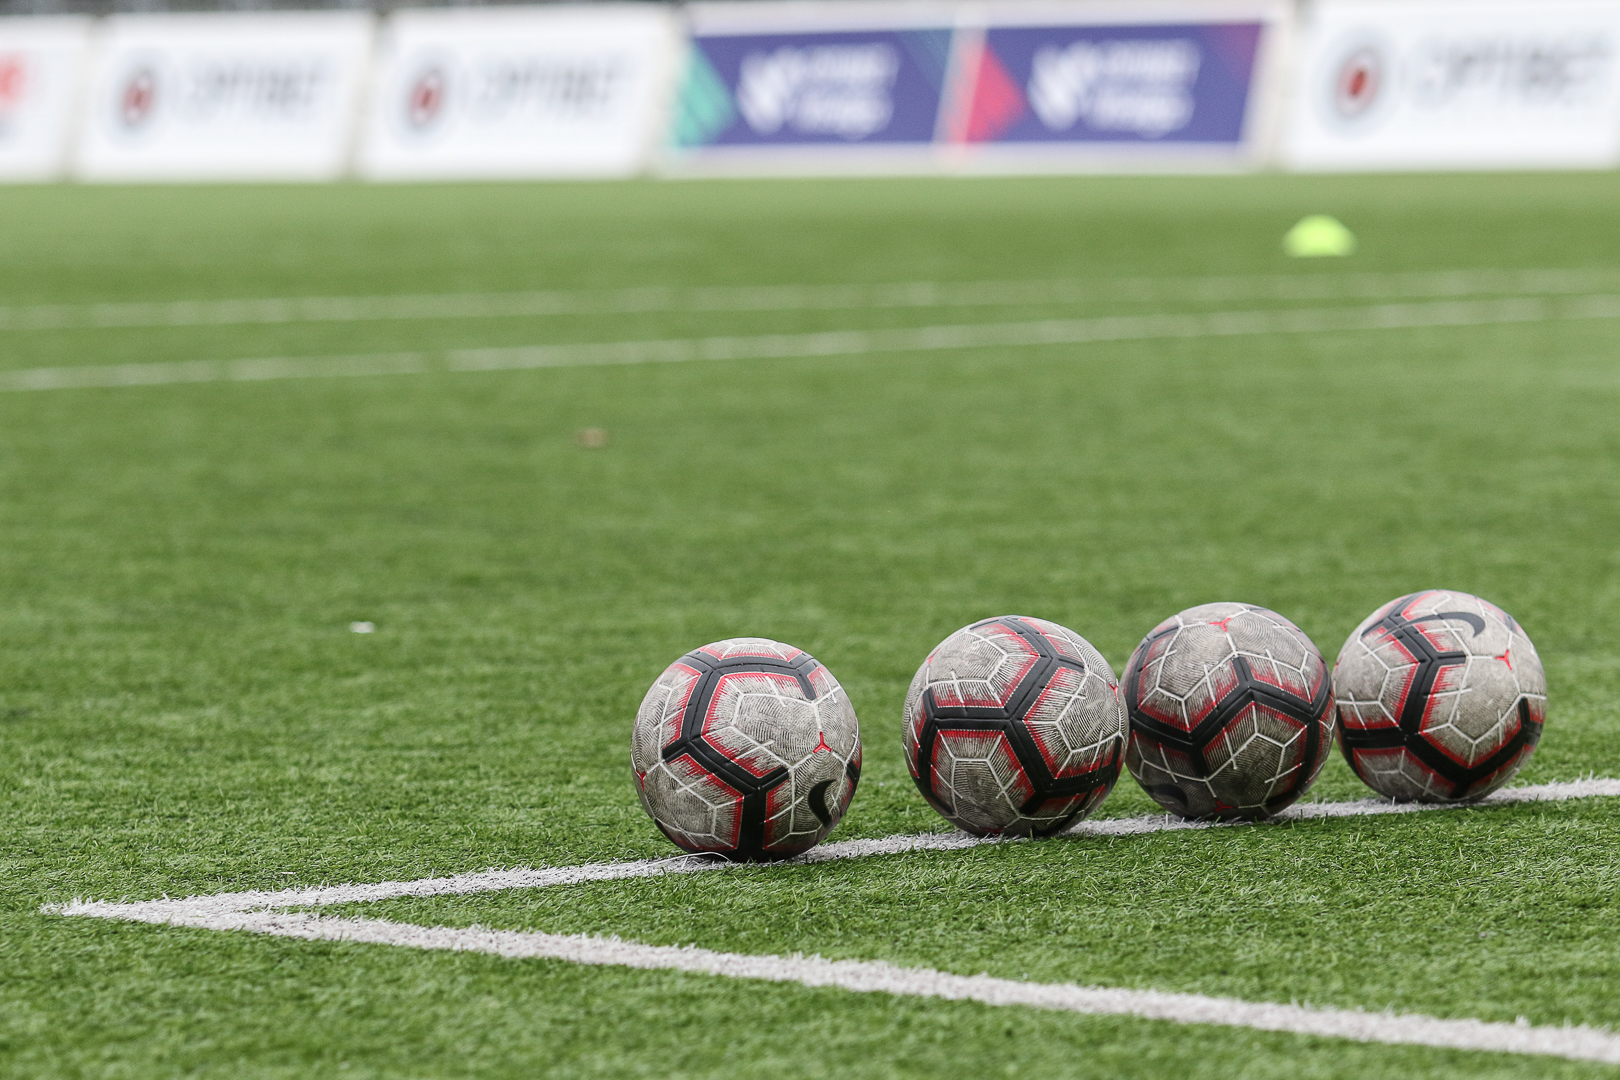 Futbolisti sacenšas virtuāli